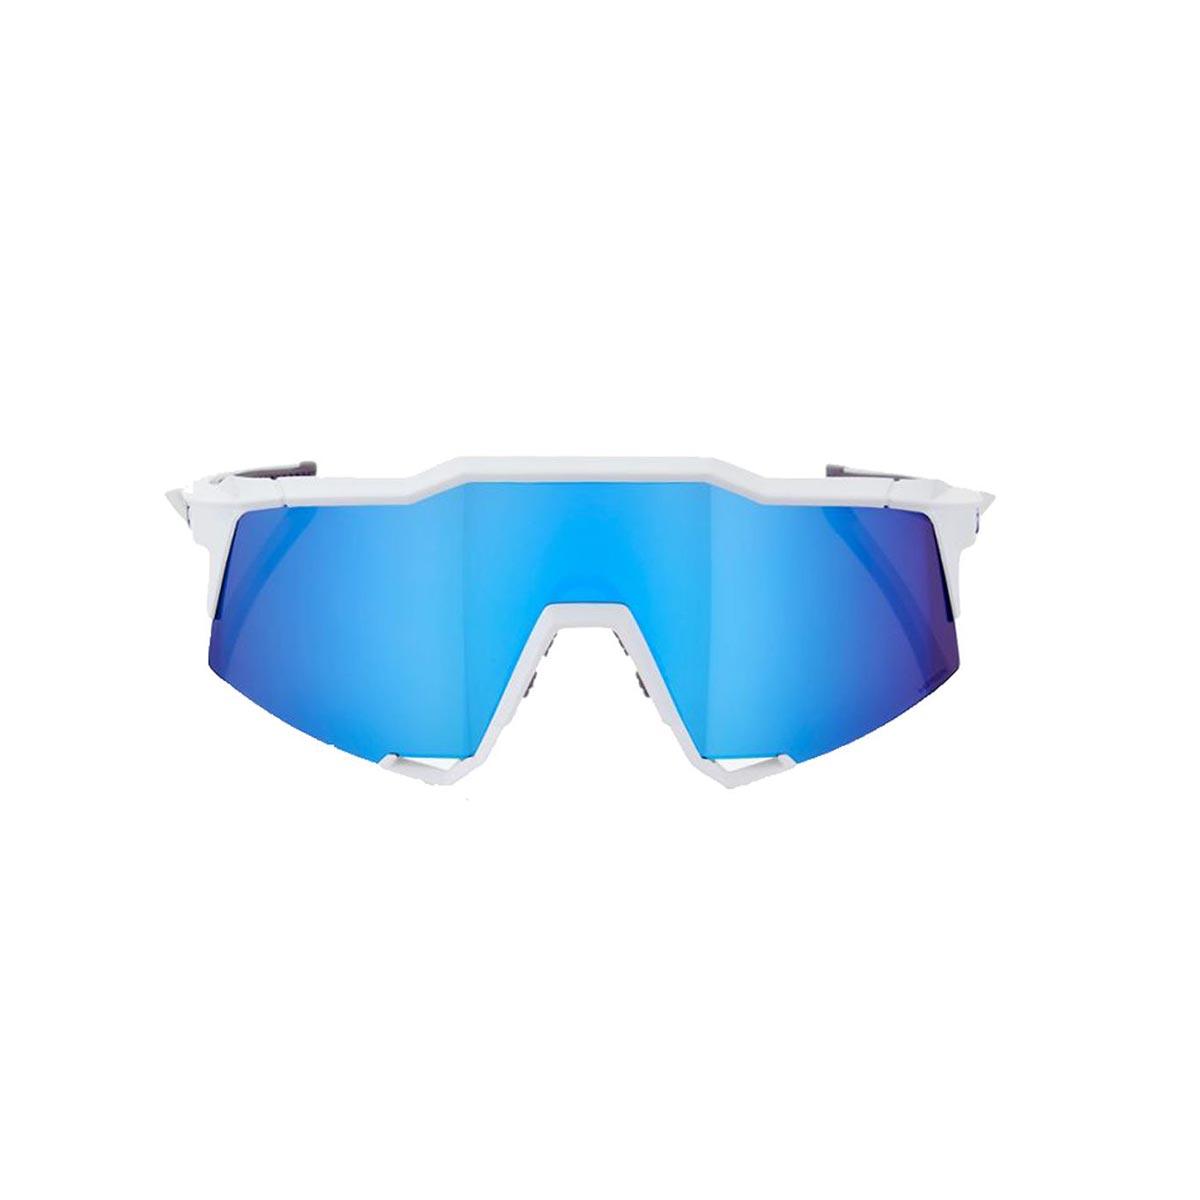 05fe672c592 SpeedCraft - Matte White - HIPER Blue Multilayer Mirror lens - Pure  Endurance